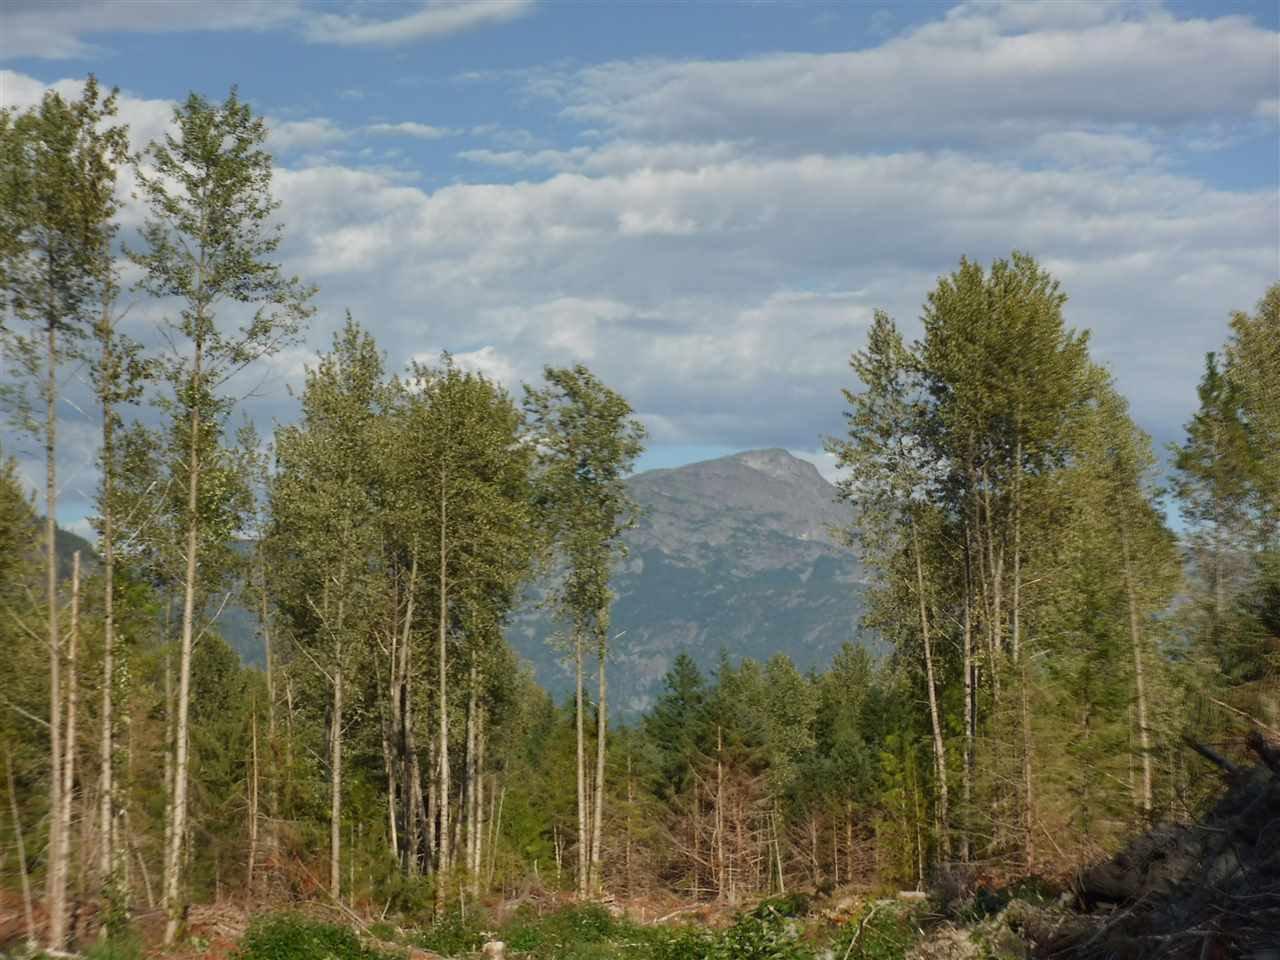 Photo 14: Photos: 3975 EAST HAMMER Road in Bella Coola: Bella Coola/Hagensborg Land for sale (Williams Lake (Zone 27))  : MLS®# R2483527